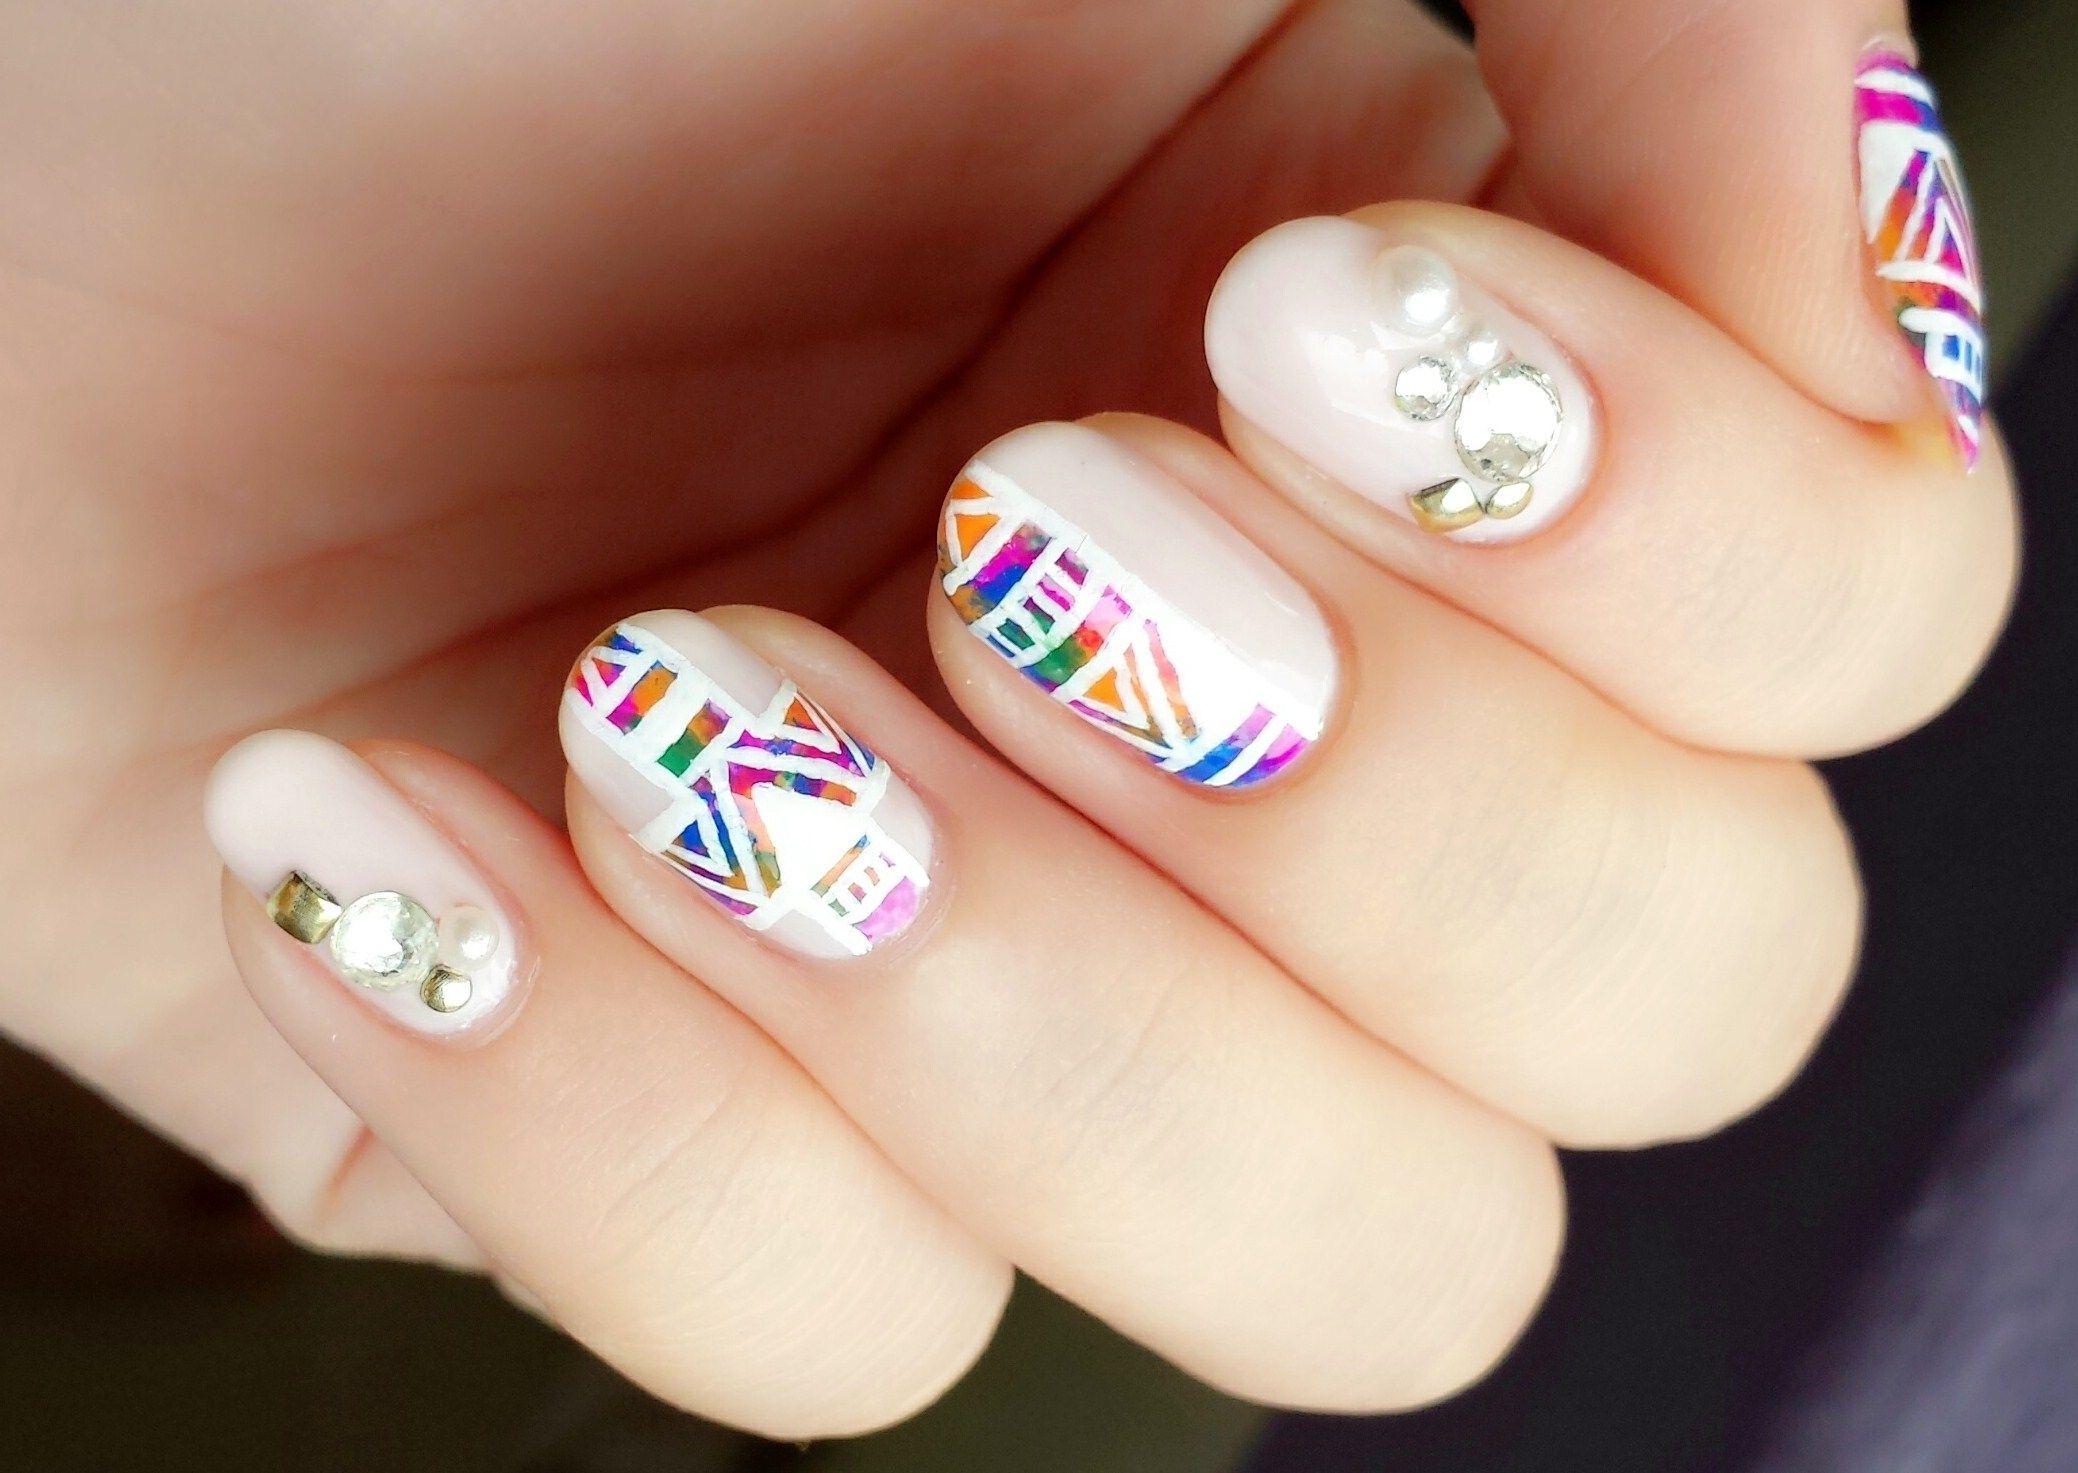 Aztec Acrylic Nail Designs | Nails | Pinterest | Acrylic nail ...